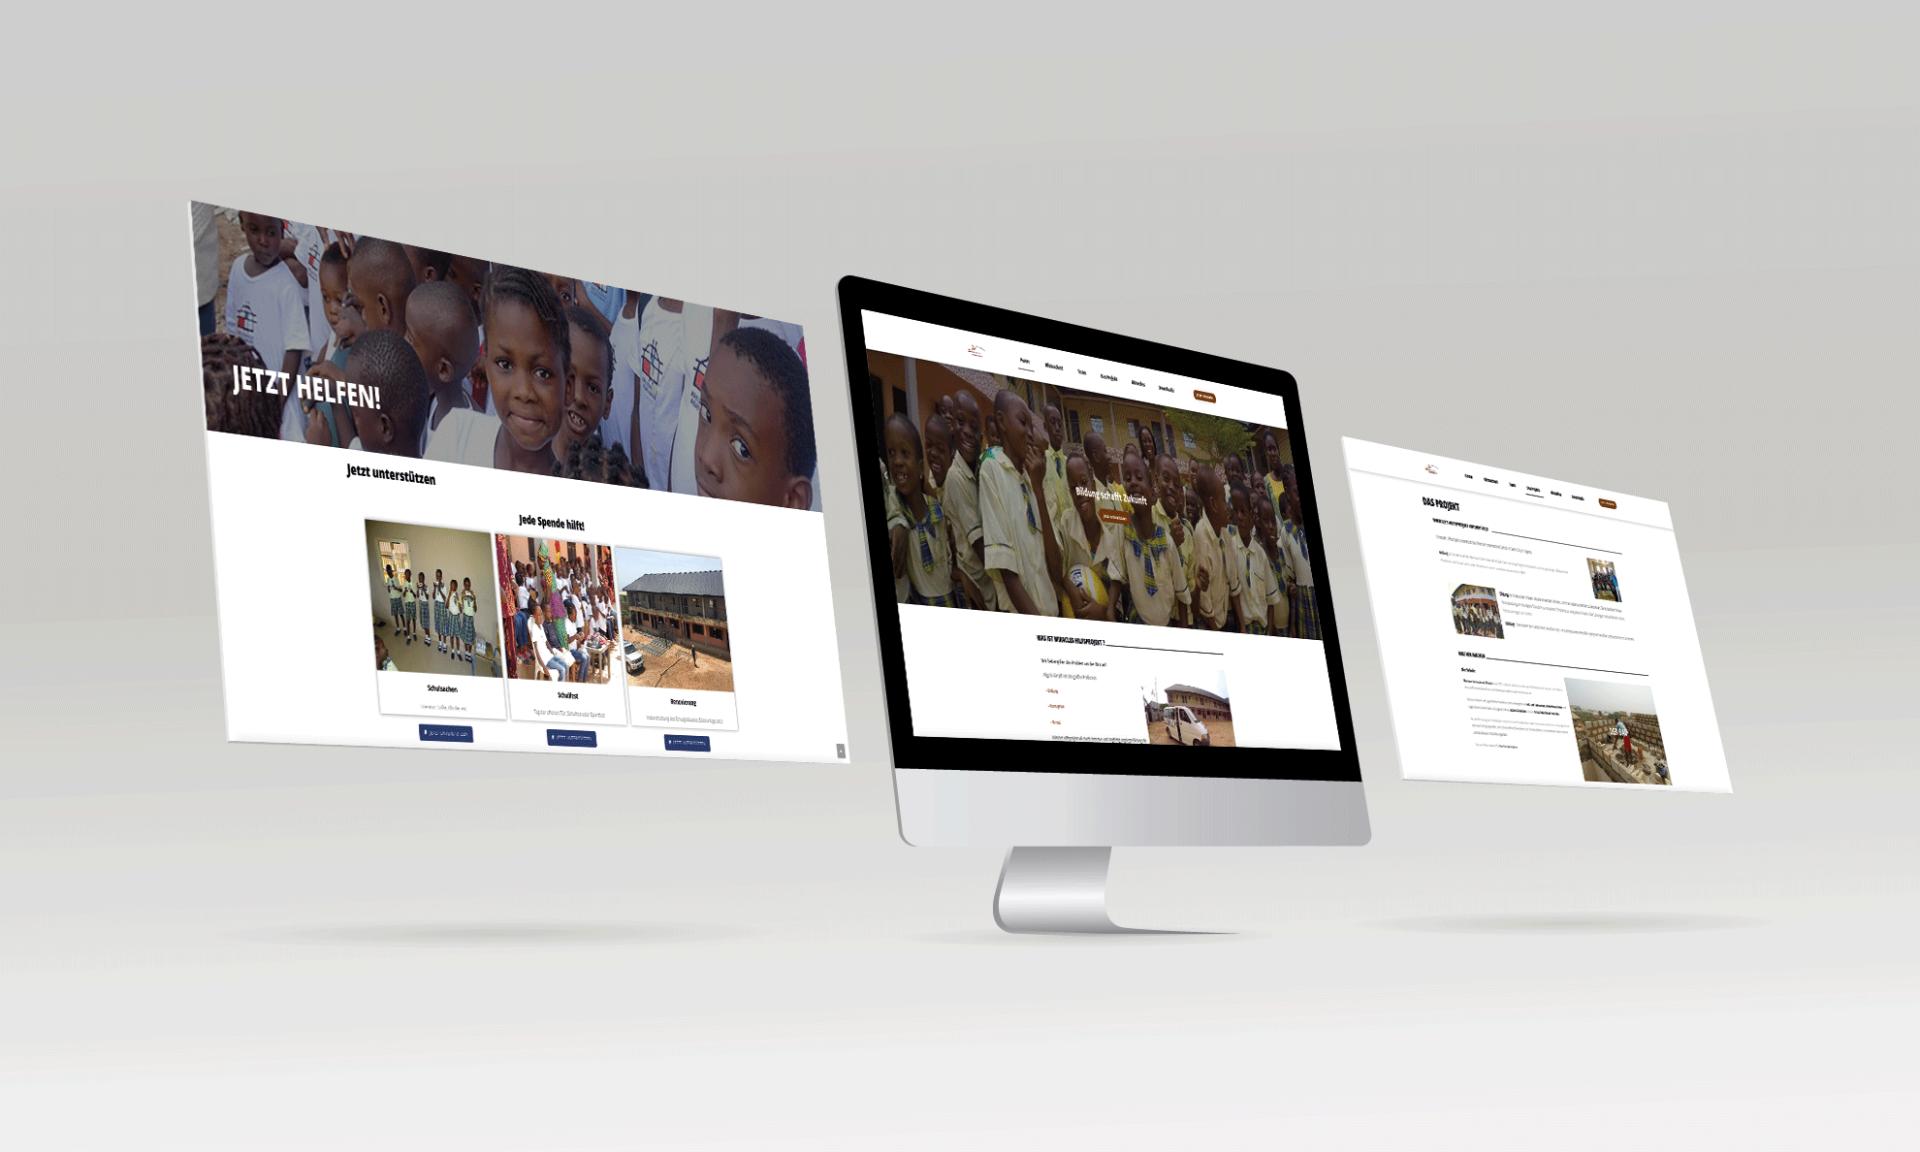 miracle's hilfsprojekt e.V. webseite - mediarenner